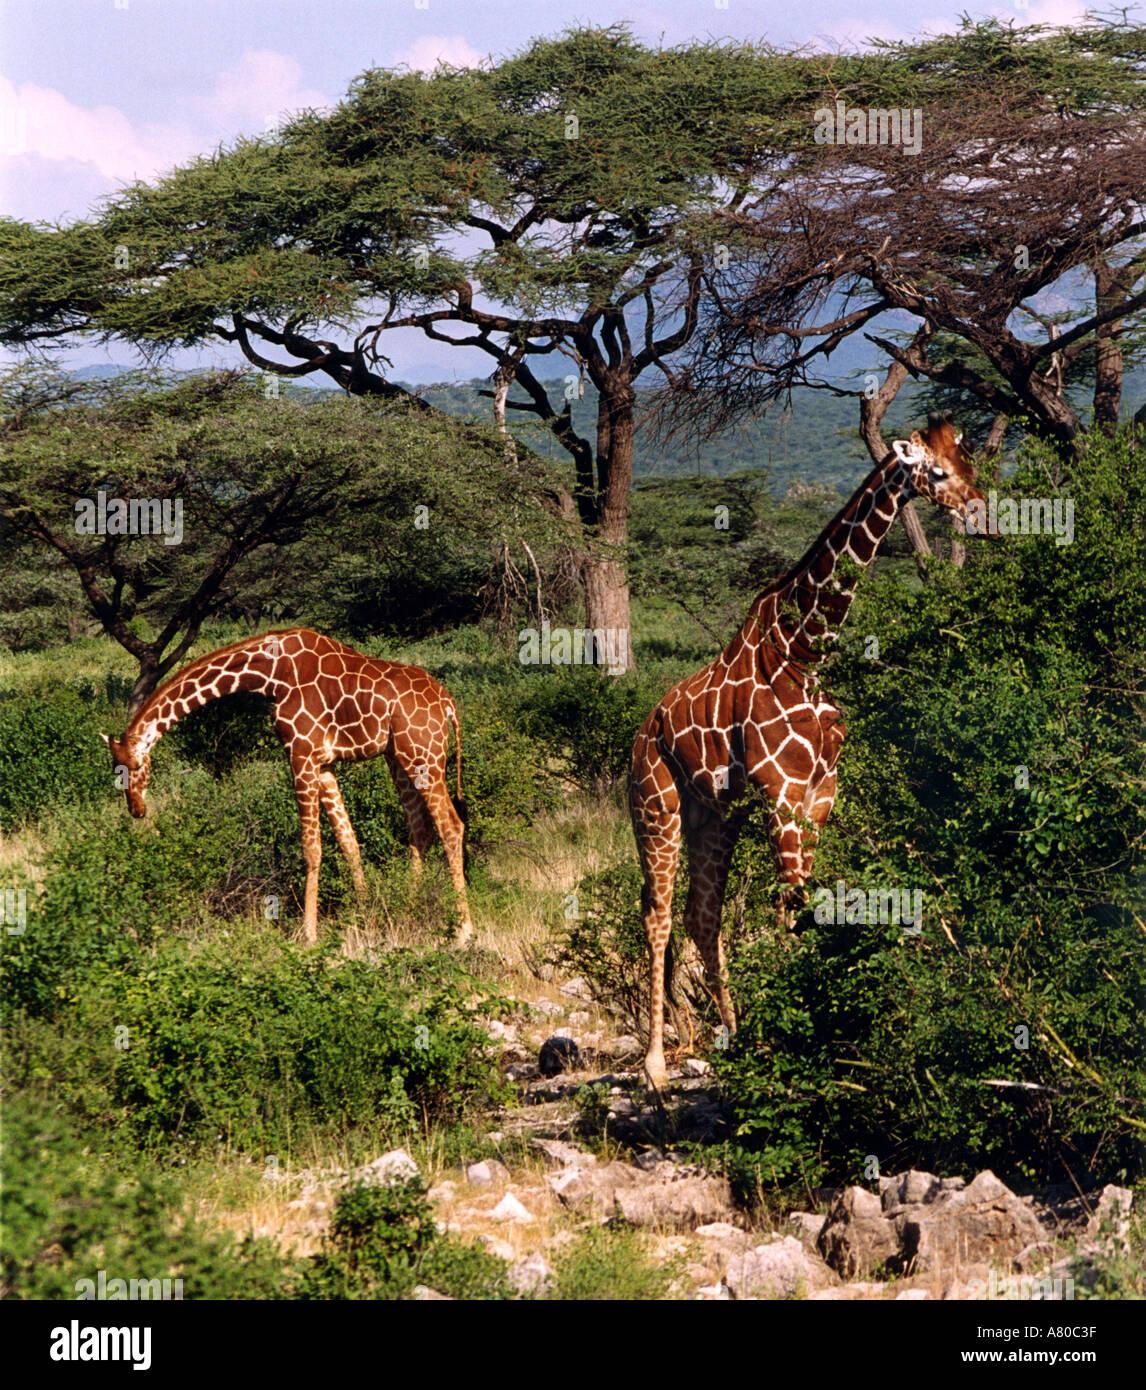 Rothschild Giraffe, Giraffa camelopardalis rothschildi Kenya - Stock Image